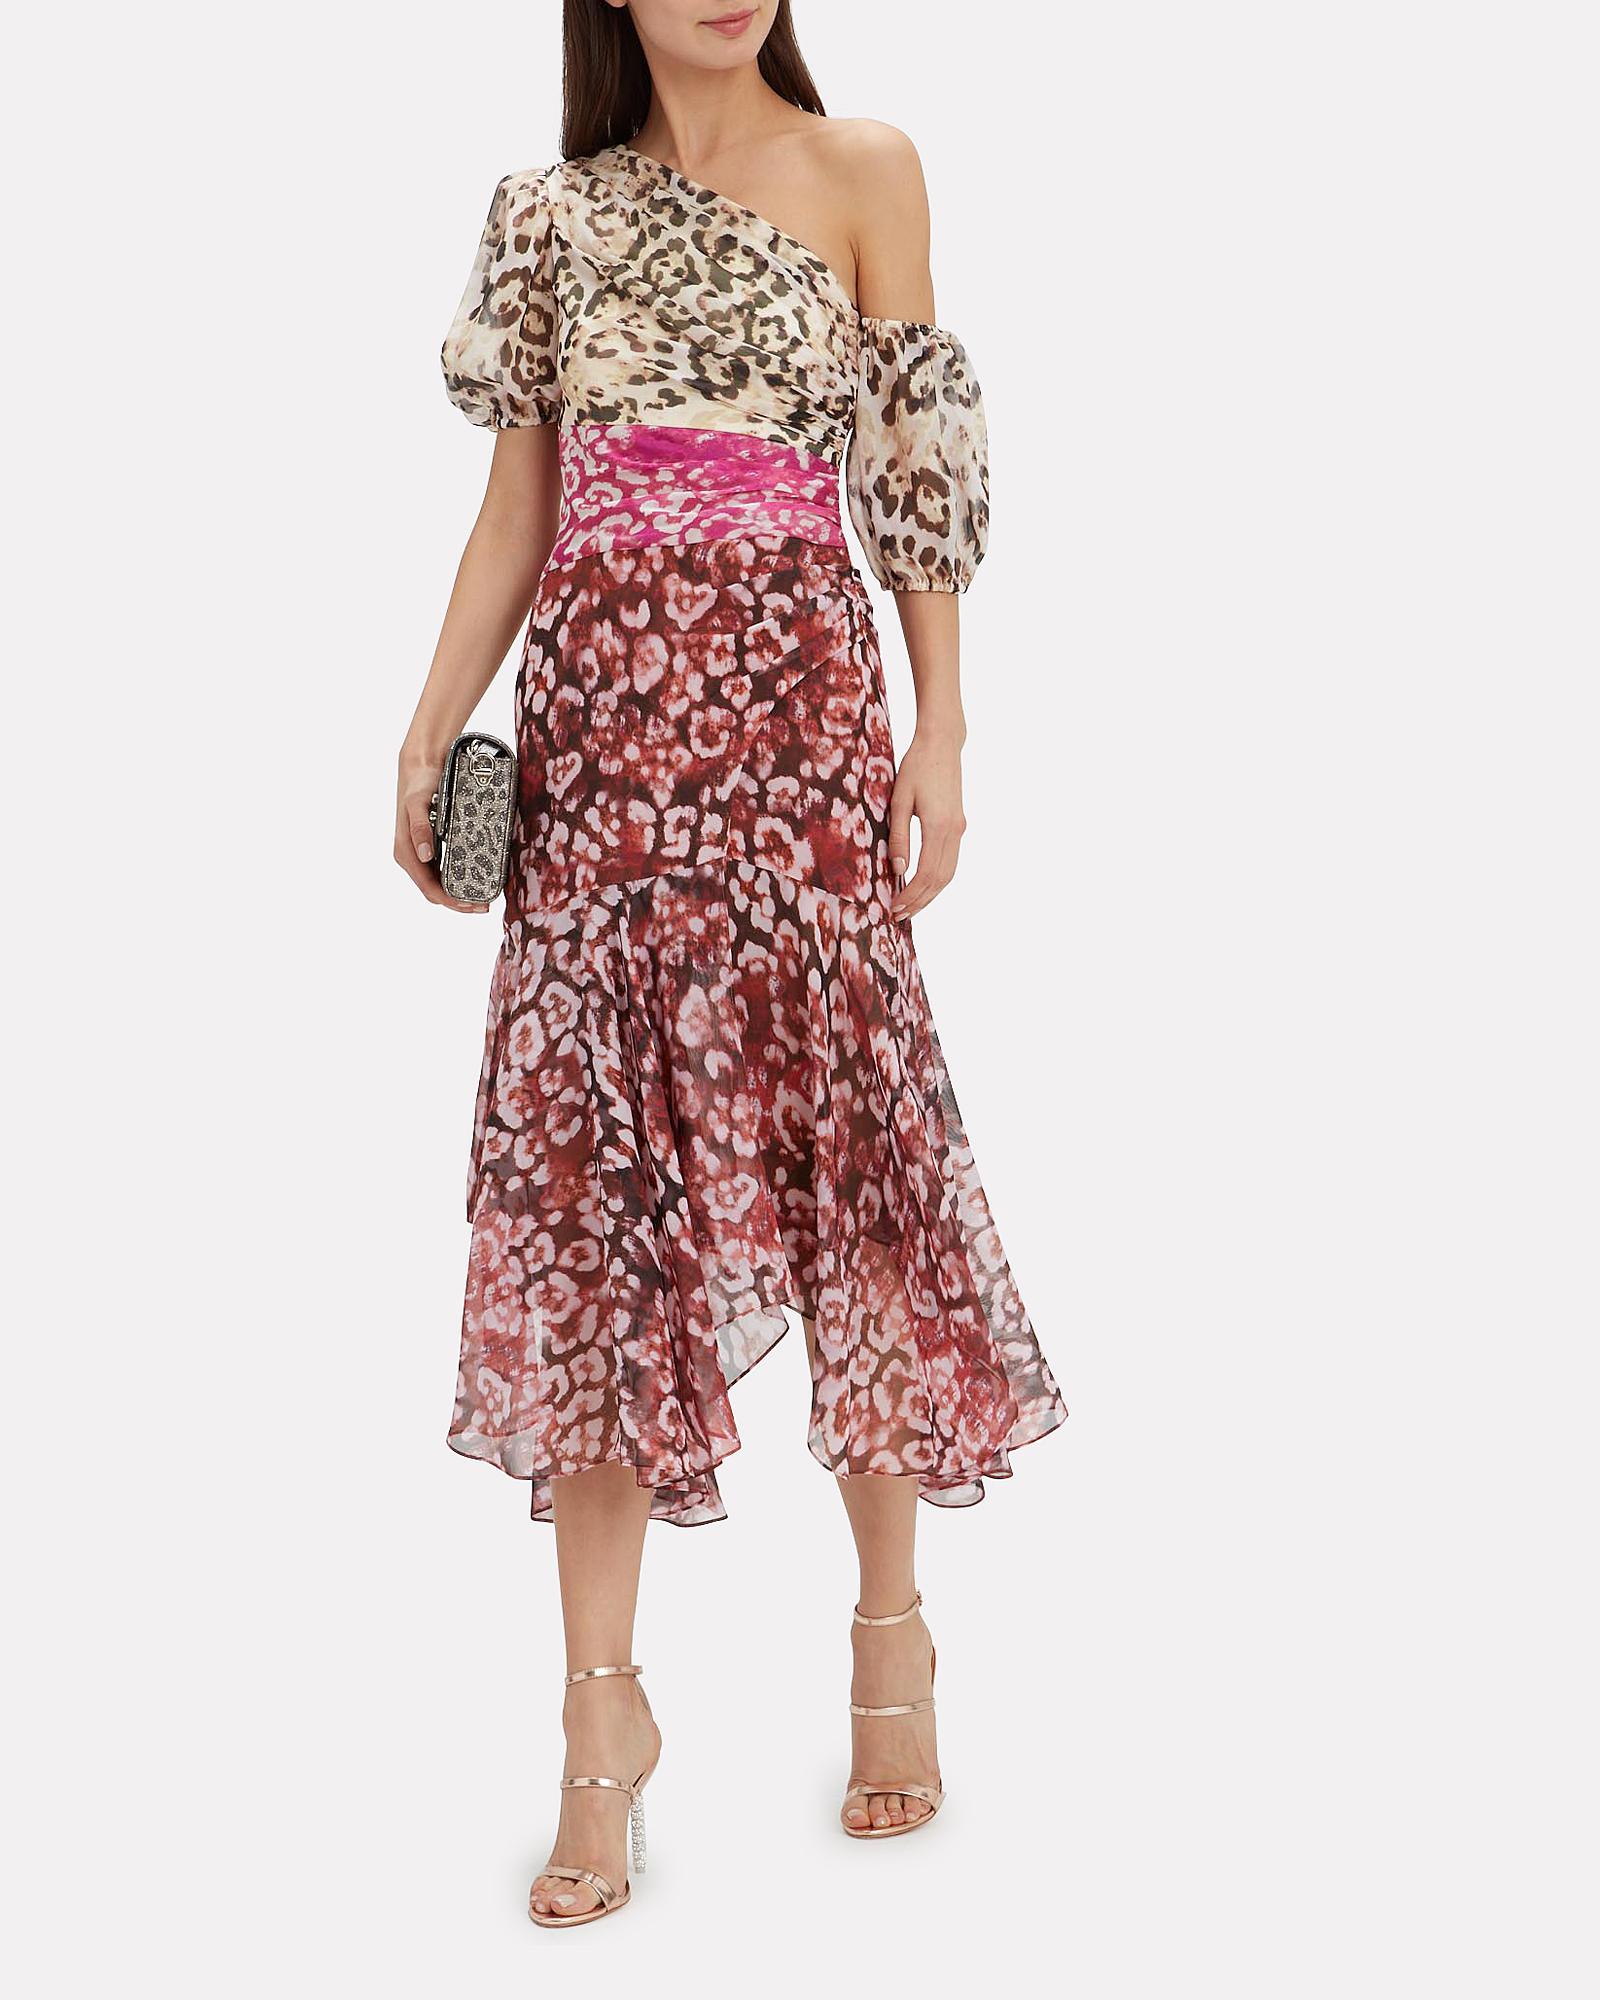 0bc376a4d1 Lyst - AMUR Jaylah One-shoulder Printed Silk-chiffon Midi Dress